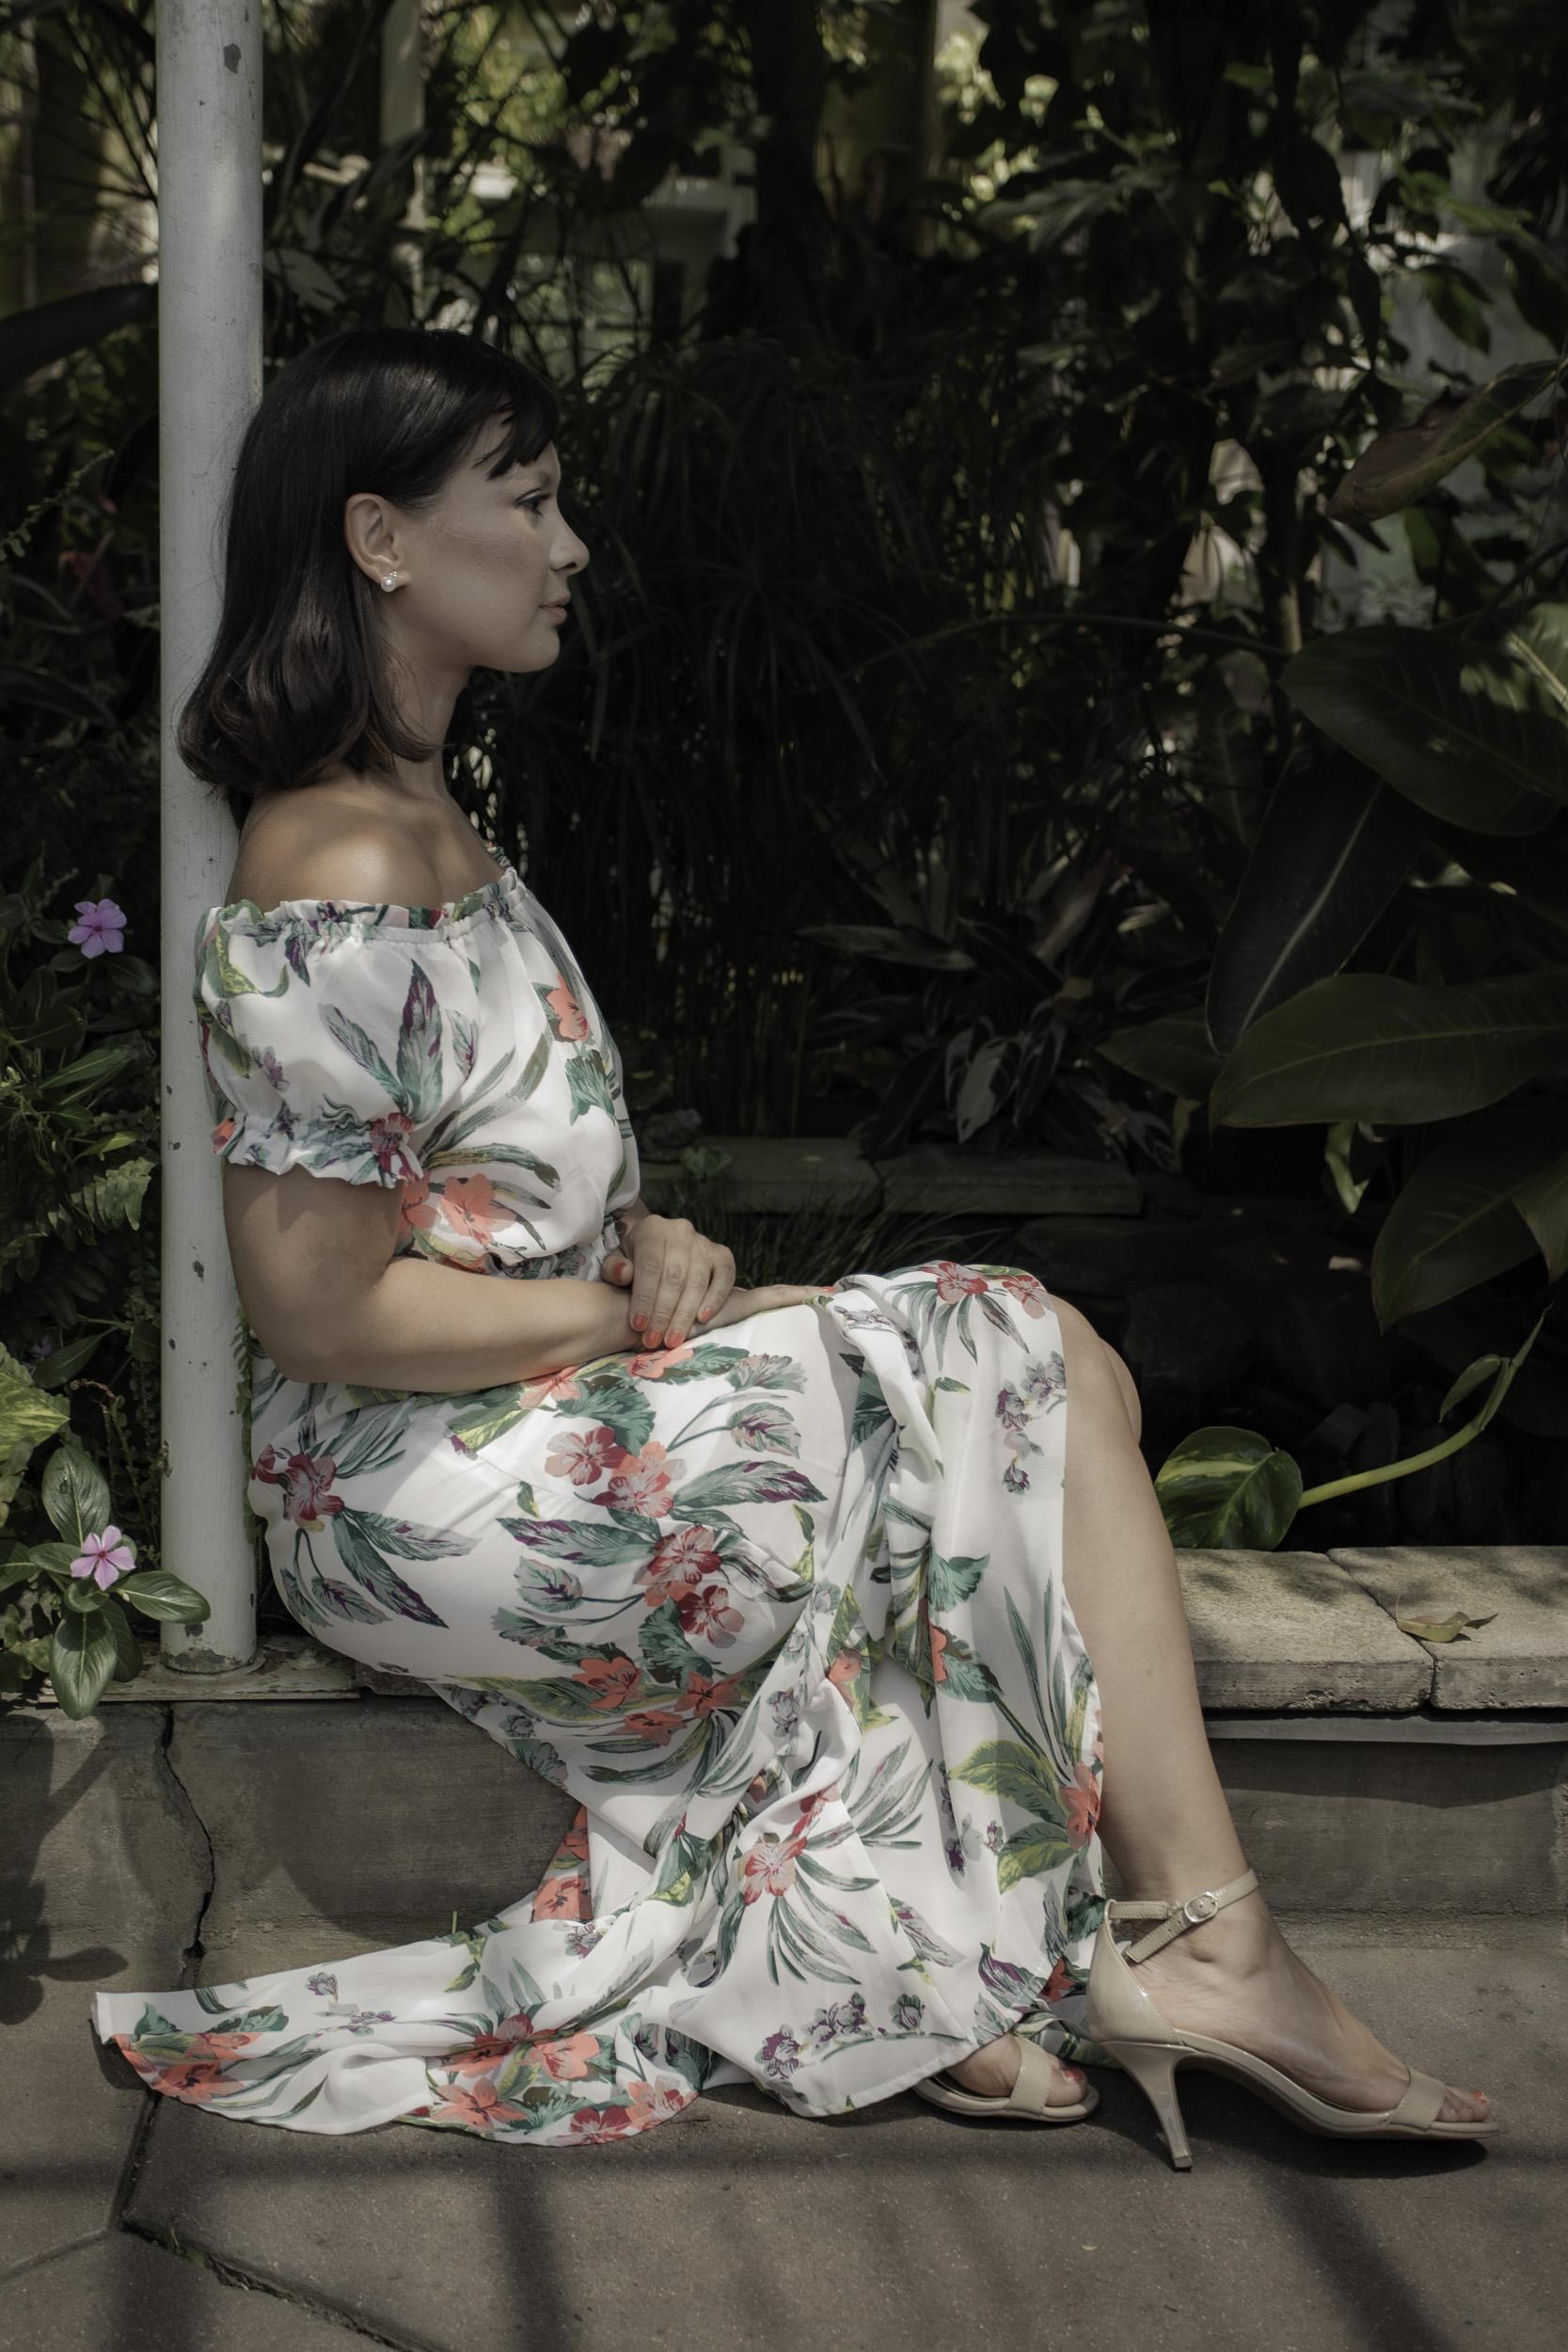 072719-photo-shoot-Marianna-Dlugosz-902.jpg